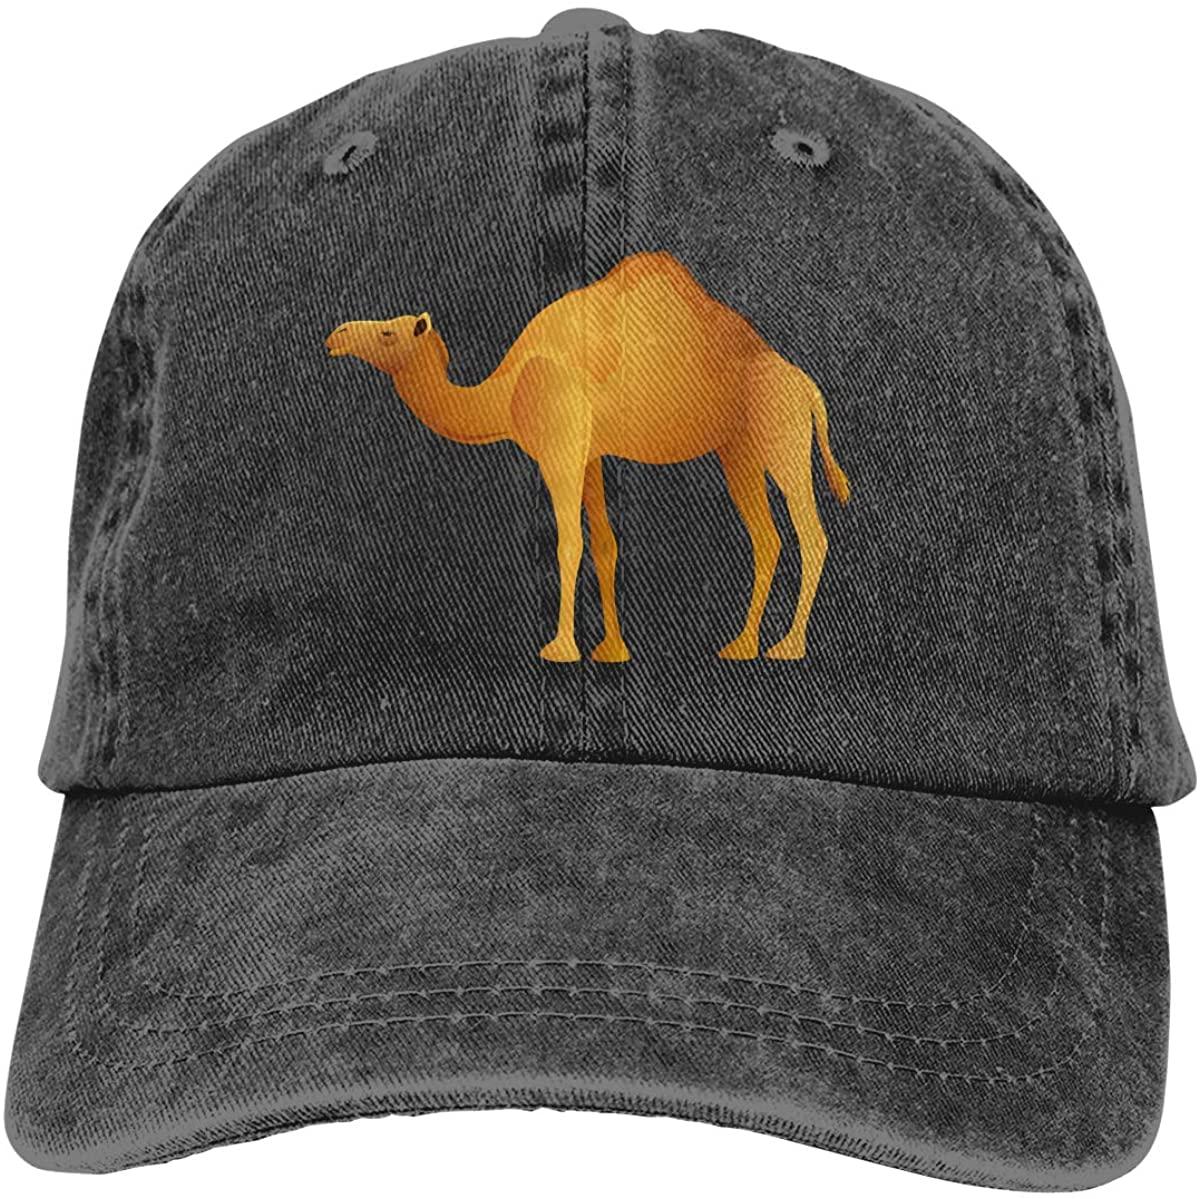 Camel Unisex Baseball Cap Cotton Cowboy Style Cap Sun Hat